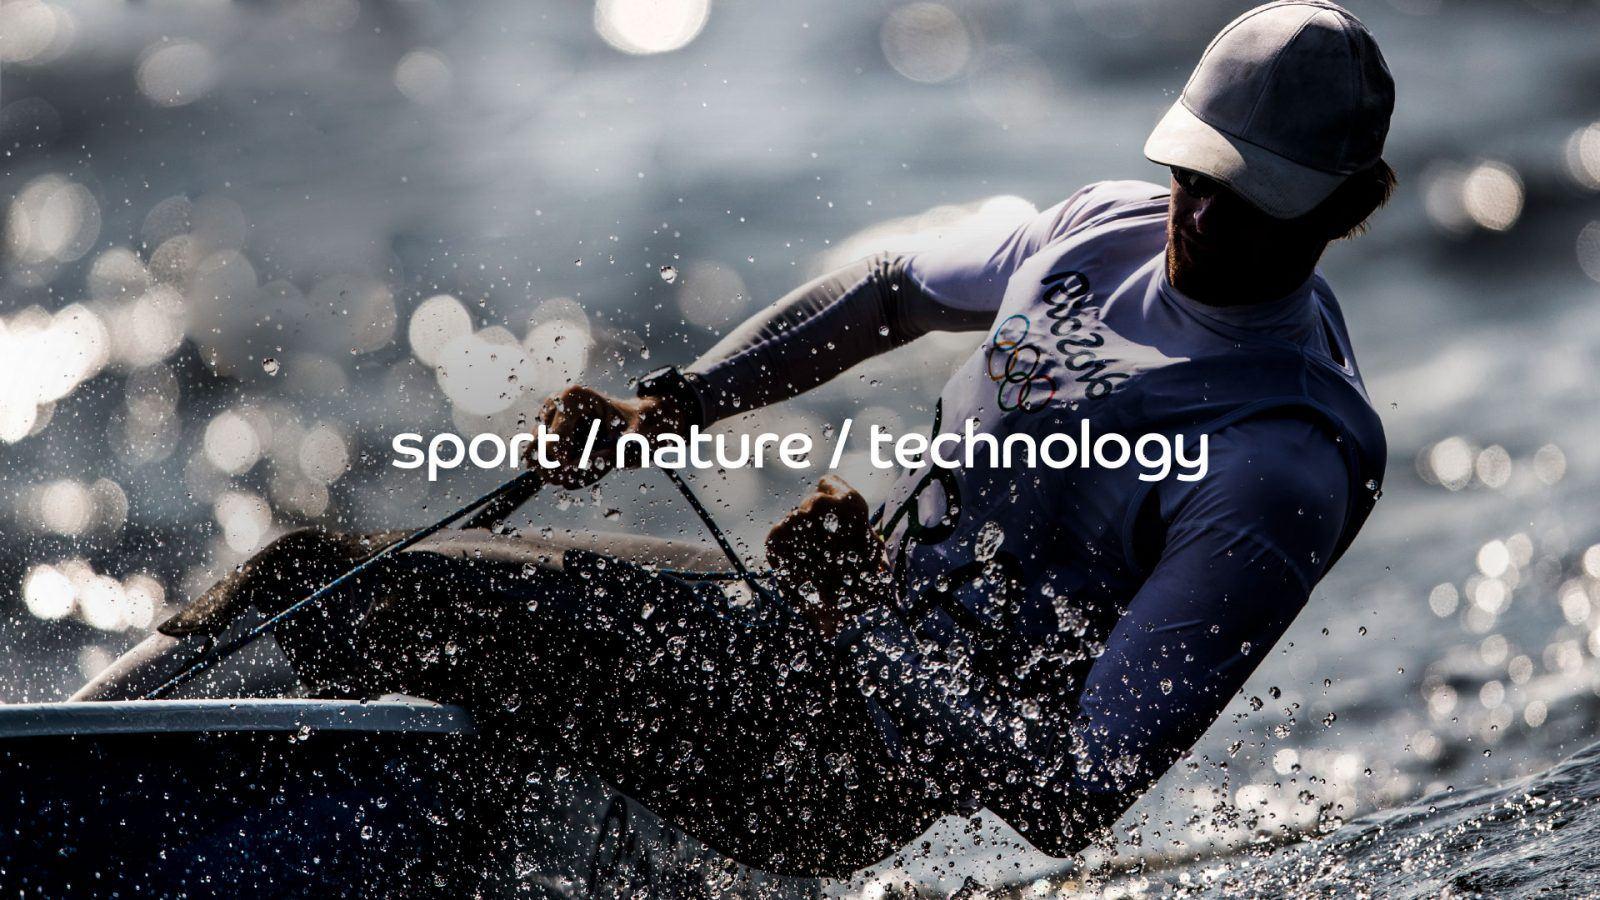 World Sailing - sport, nature and technology